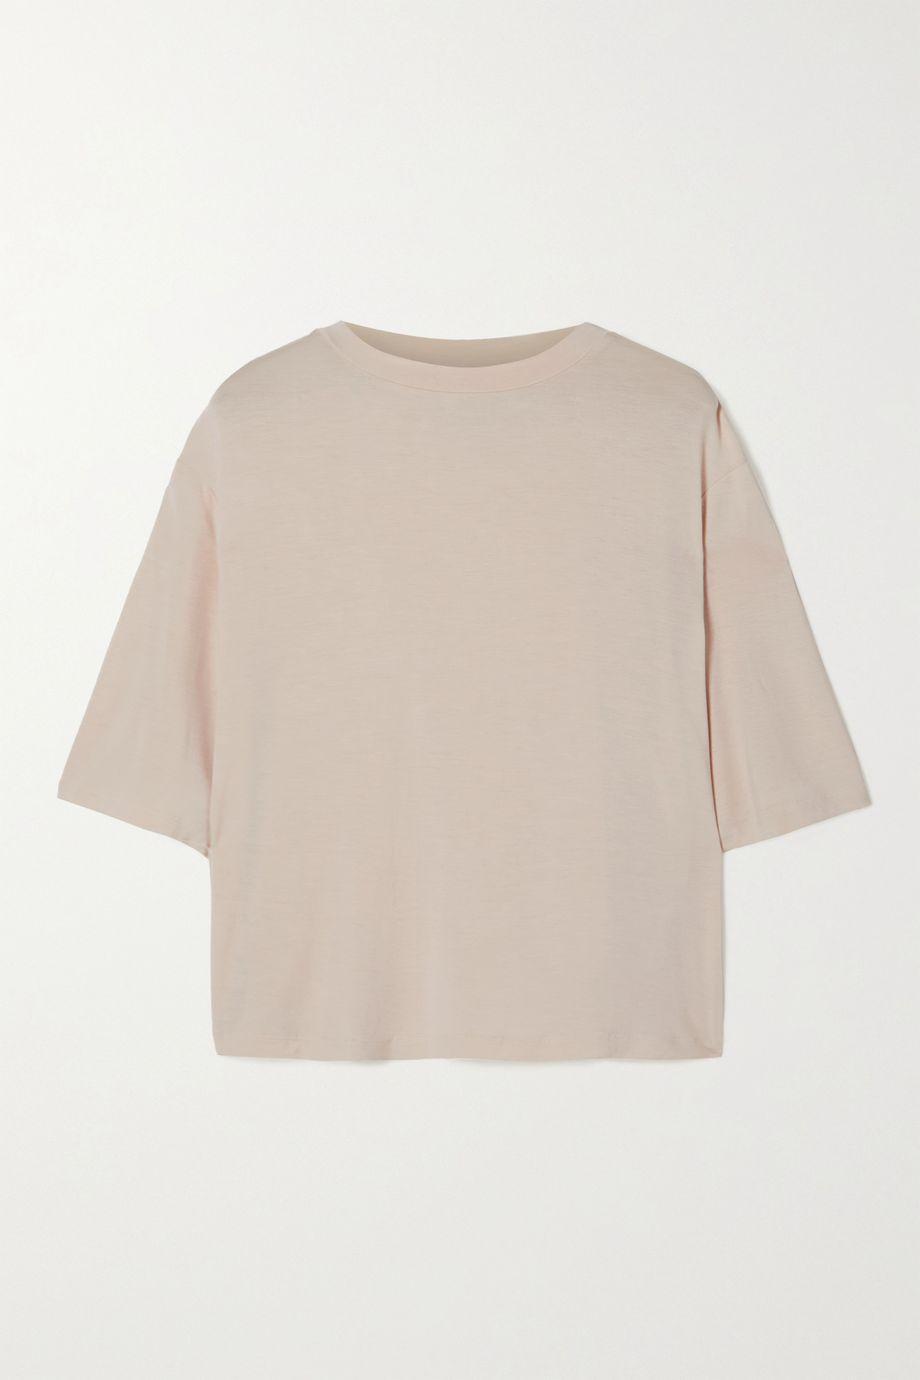 Varley Robin stretch-bamboo T-shirt